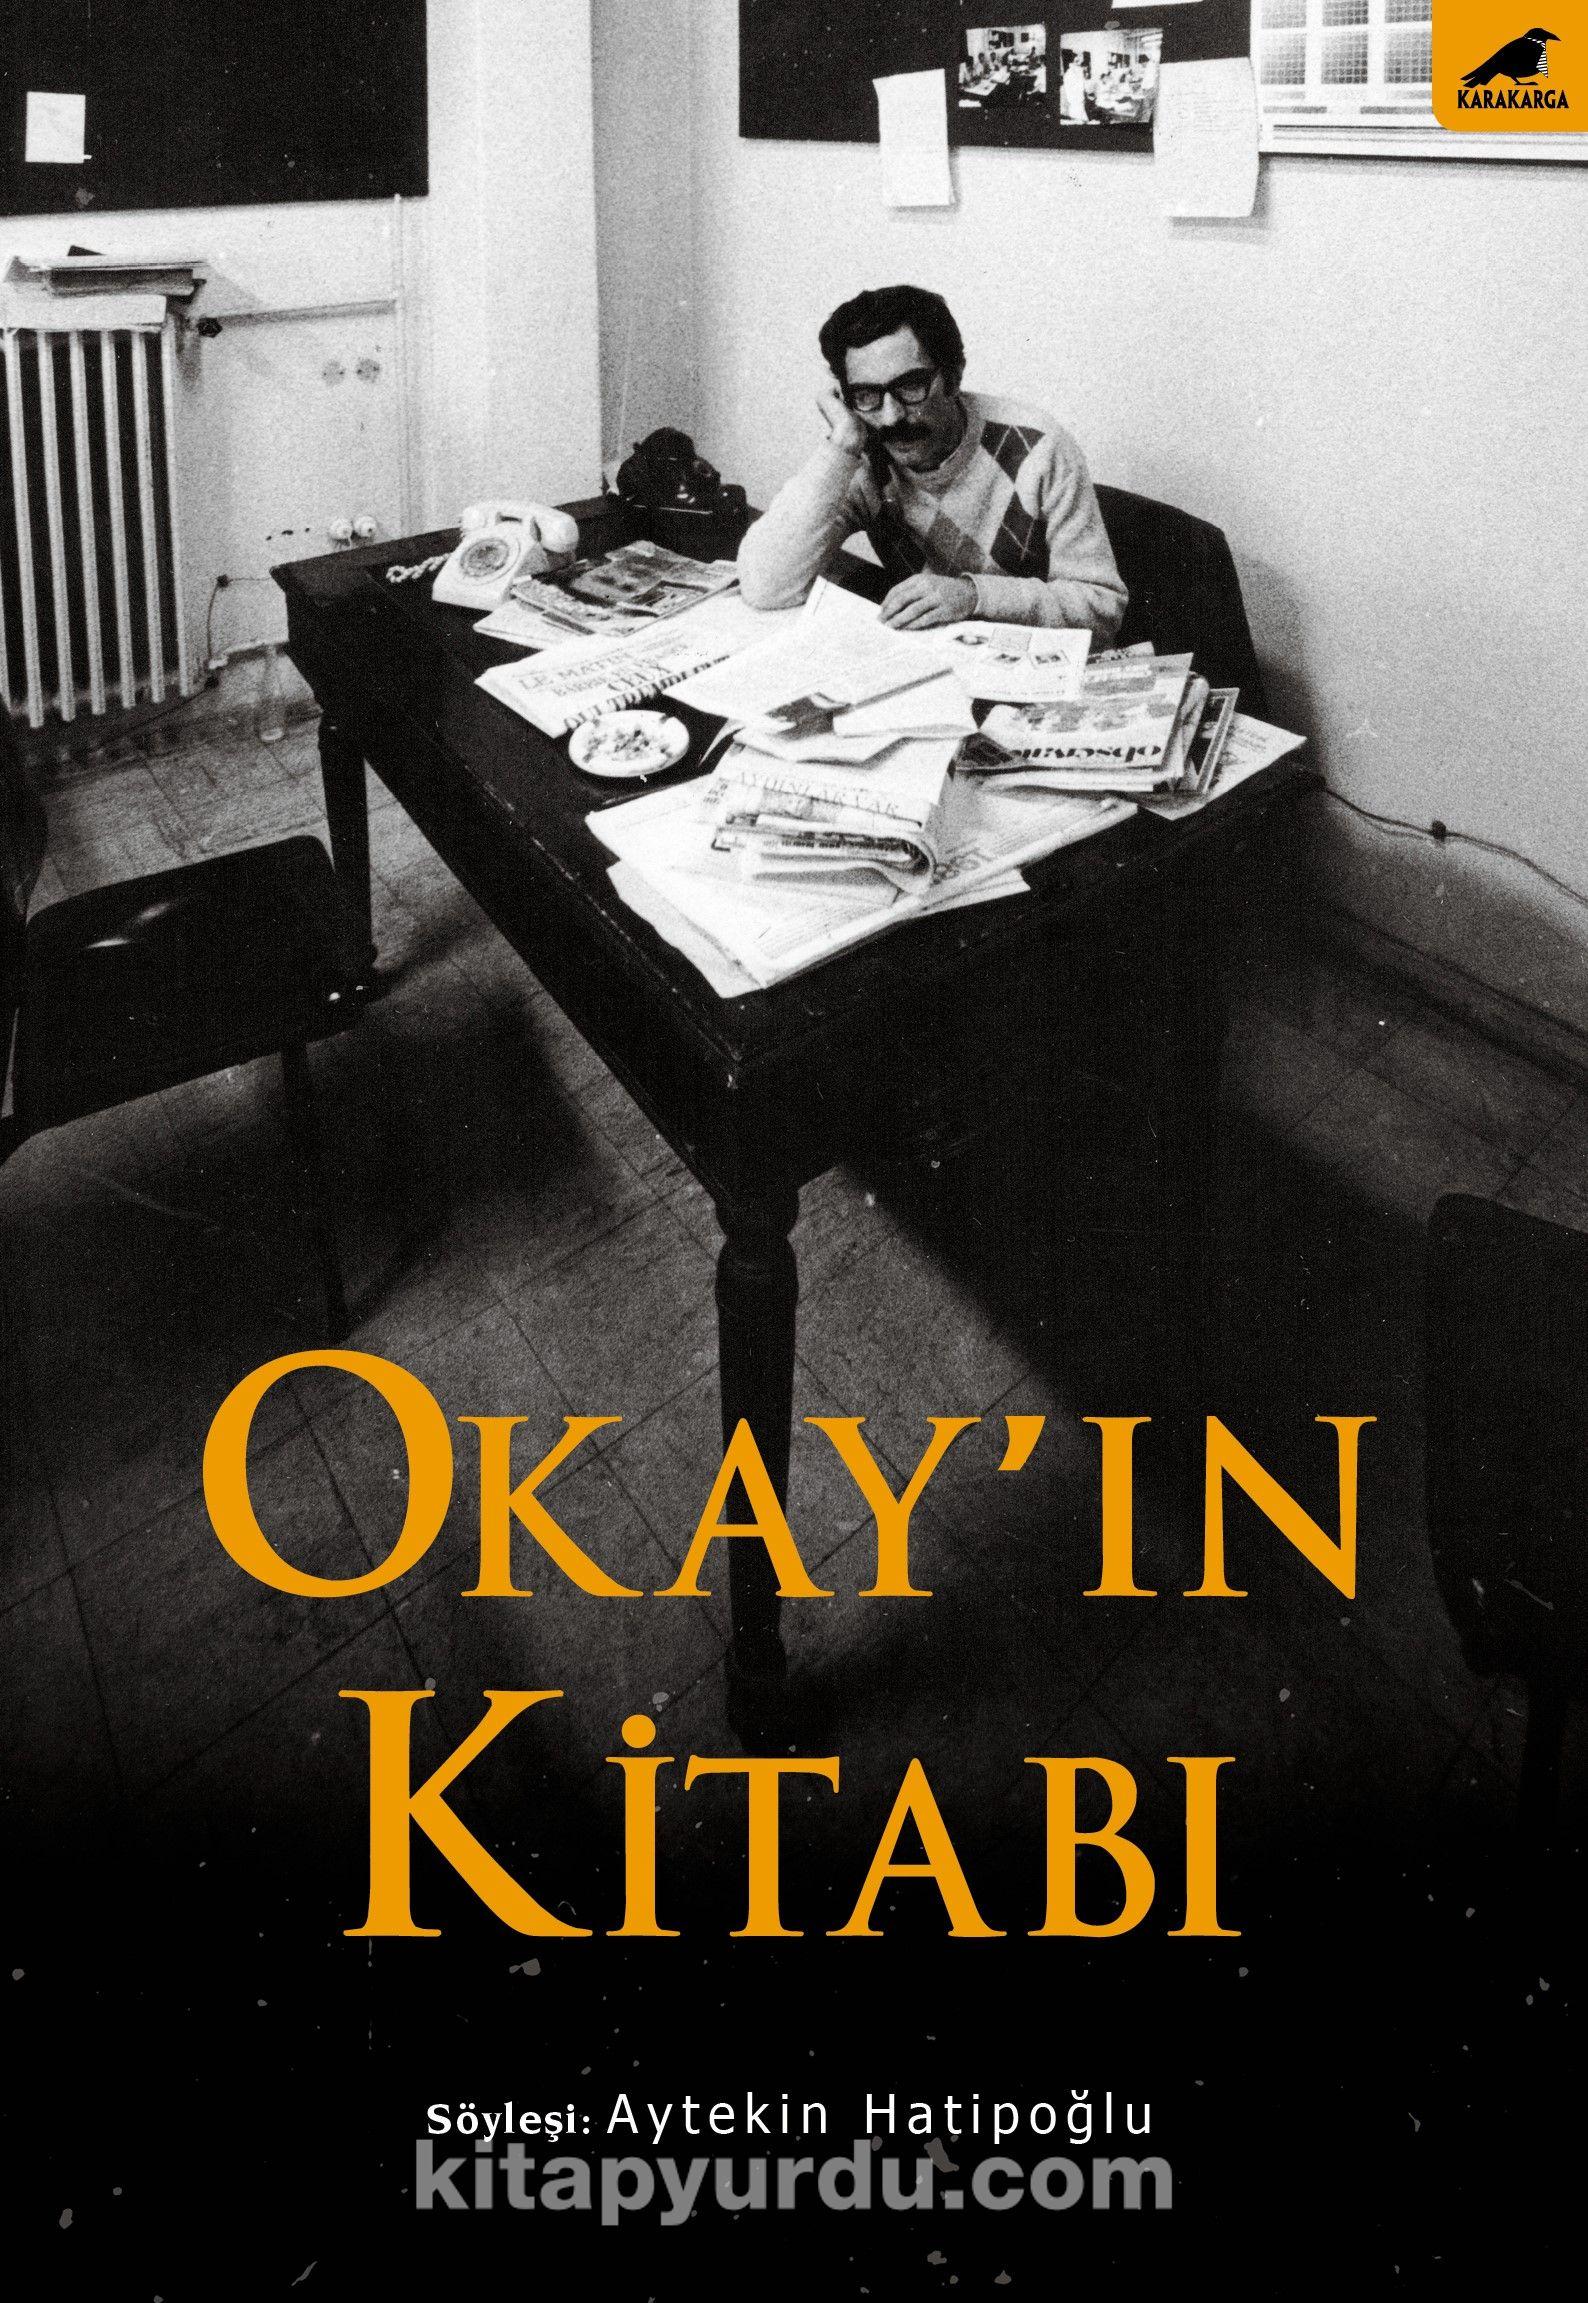 Okay'ın Kitabı - Aytekin Hatipoğlu pdf epub